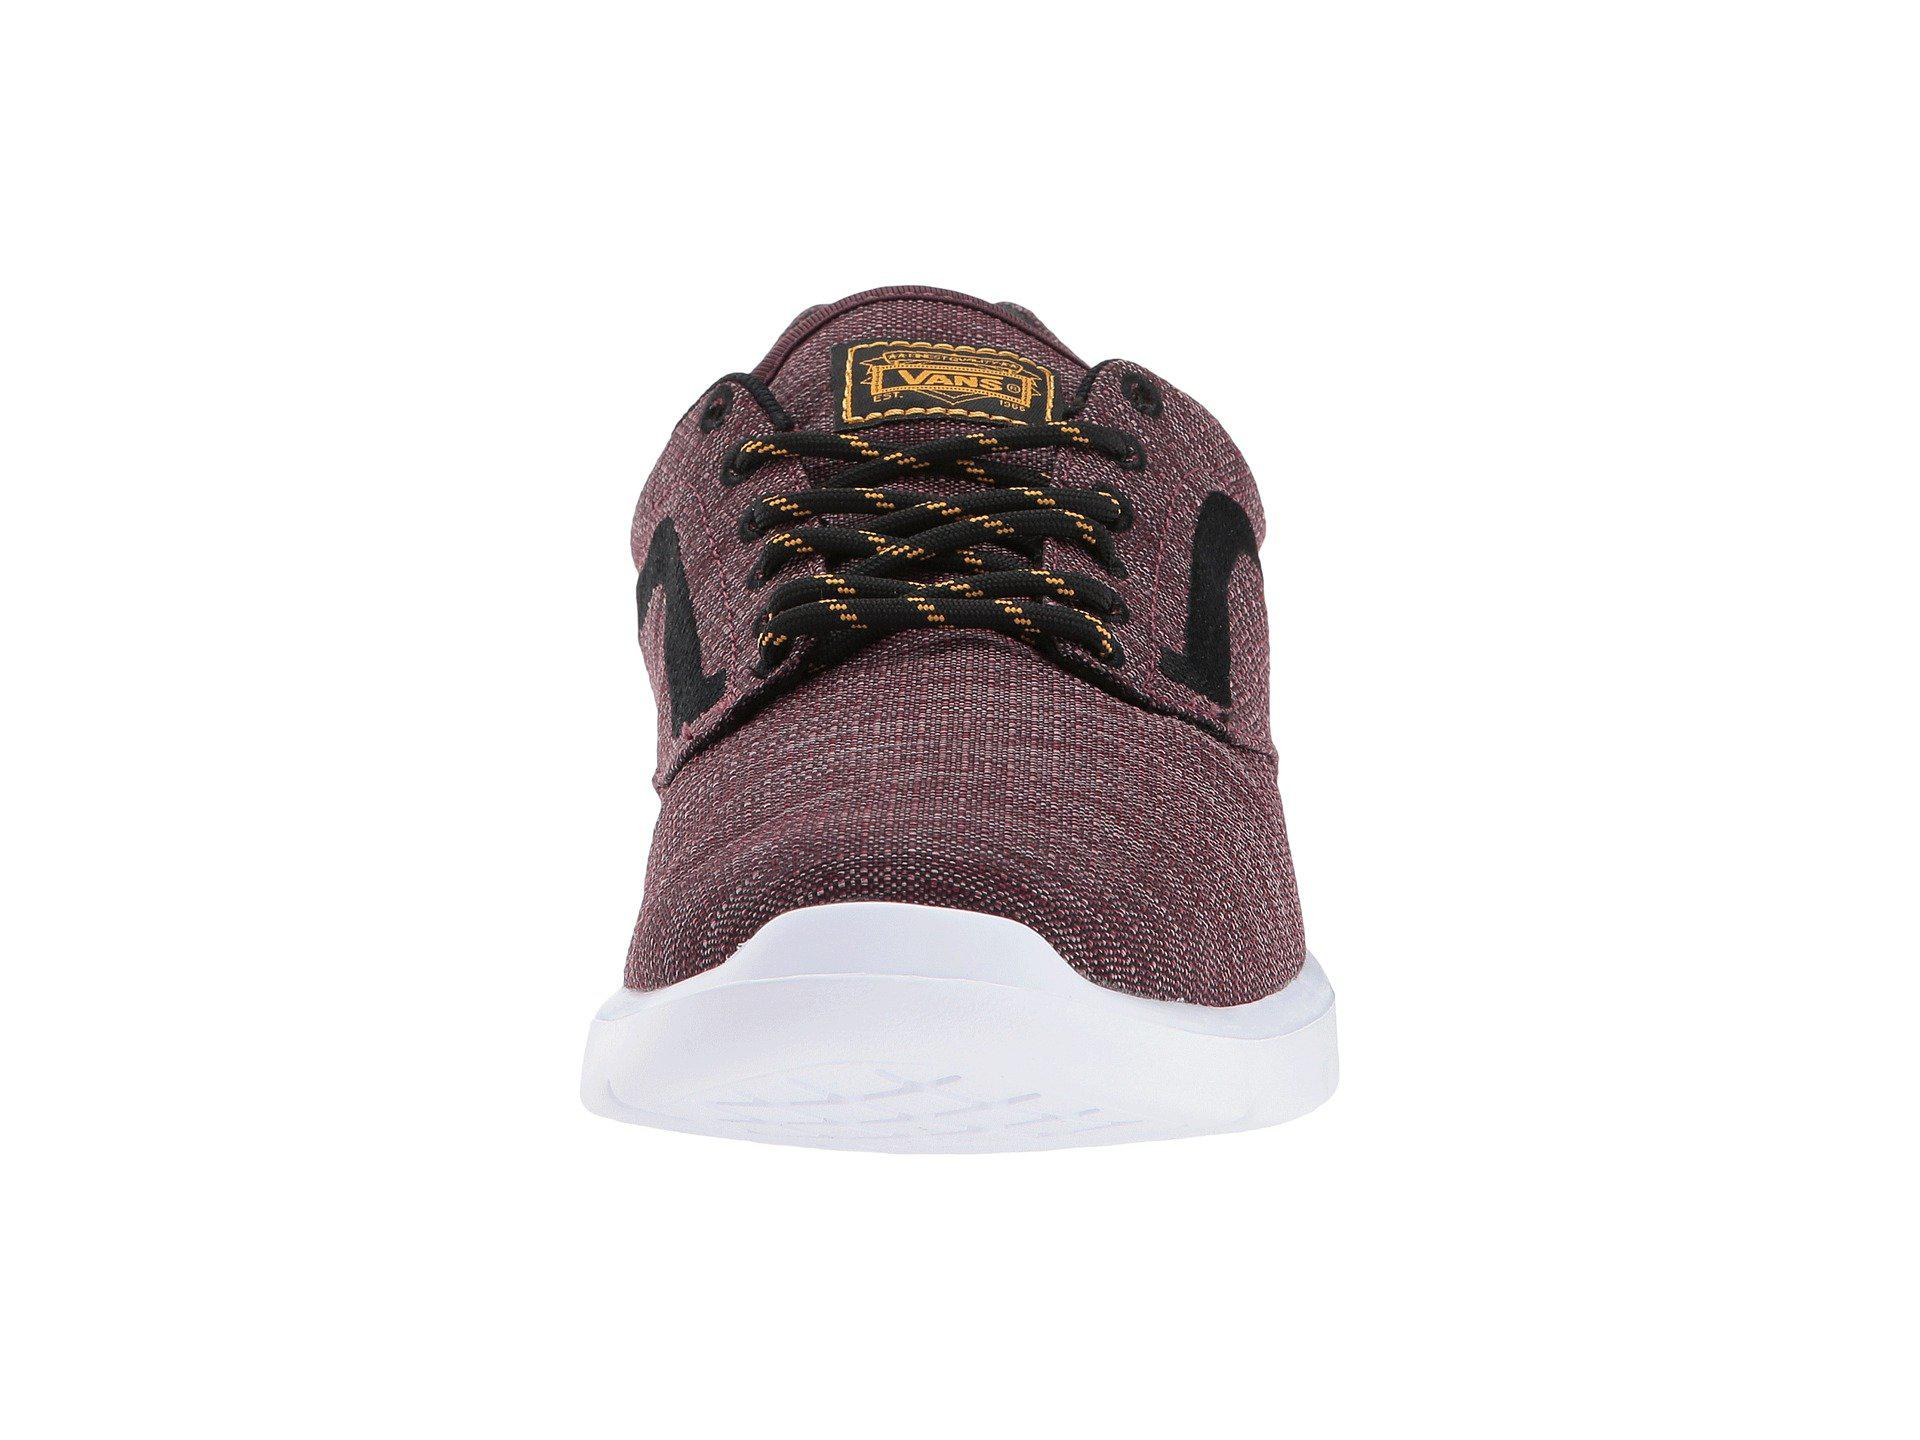 c689bdbe17 Lyst - Vans Iso 1.5 ((military Mono) Micro Chip) Men s Skate Shoes ...